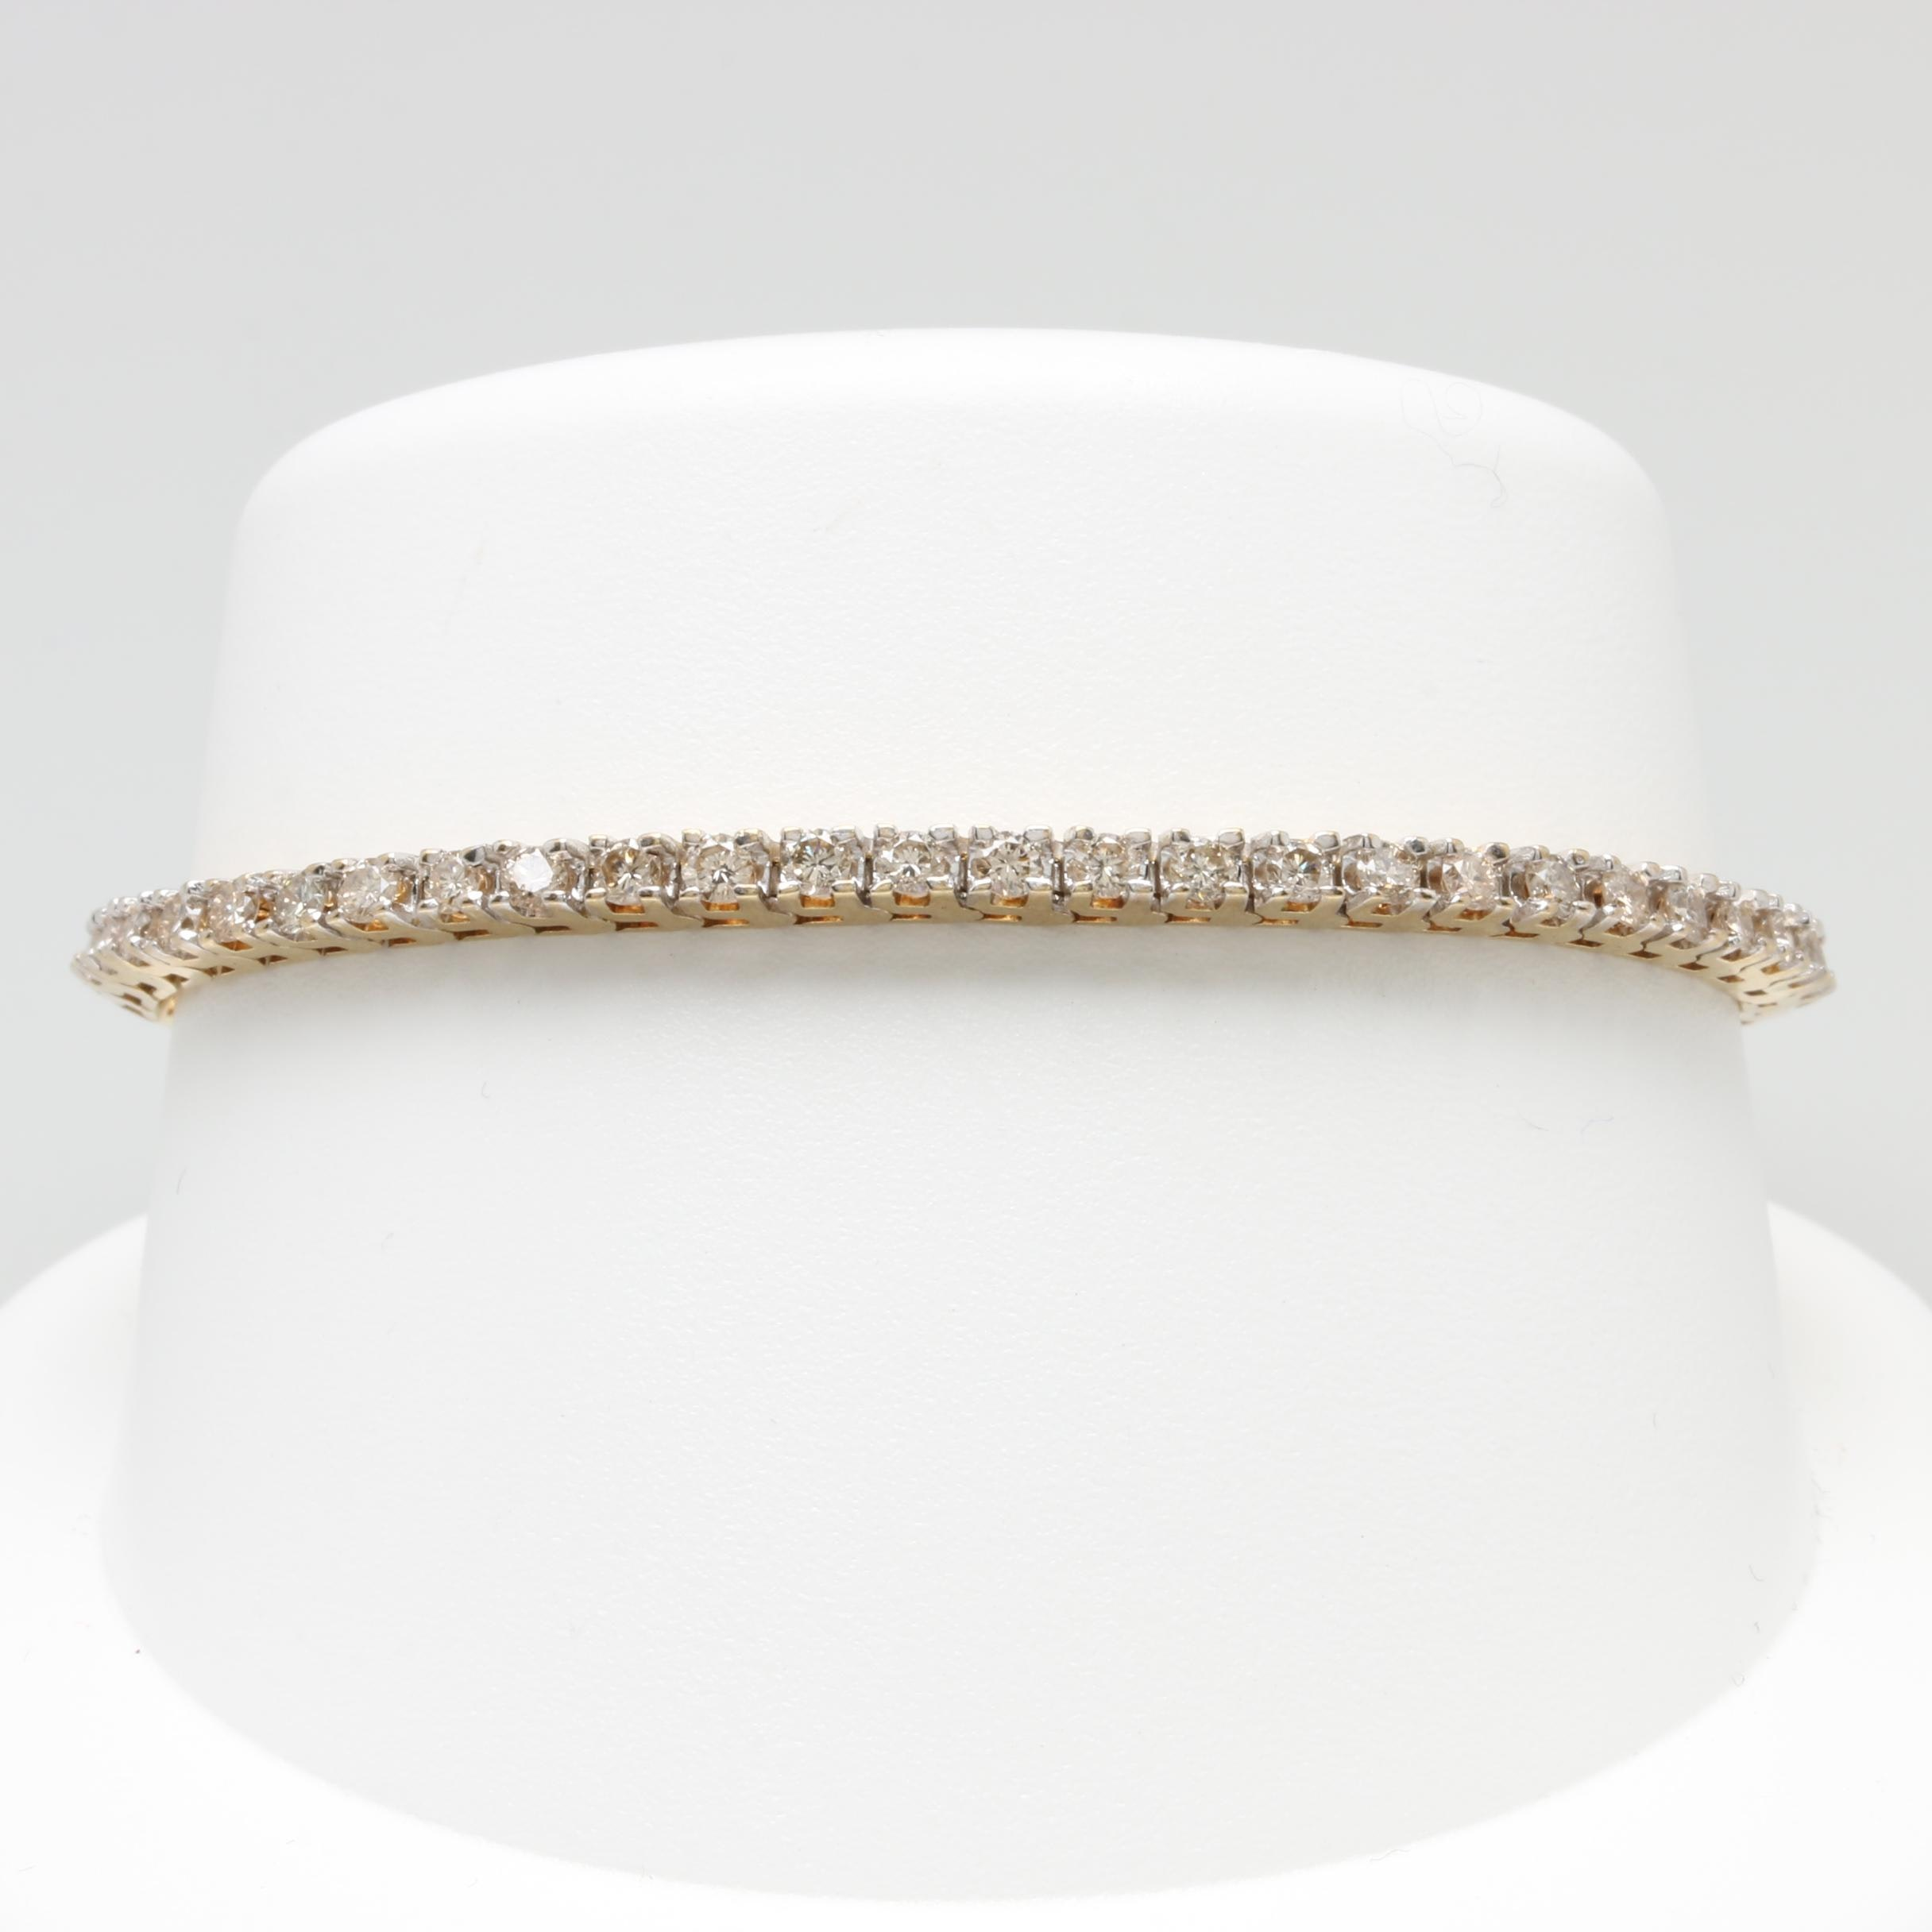 10K Yellow Gold 2.75 CTW Diamond Tennis Bracelet